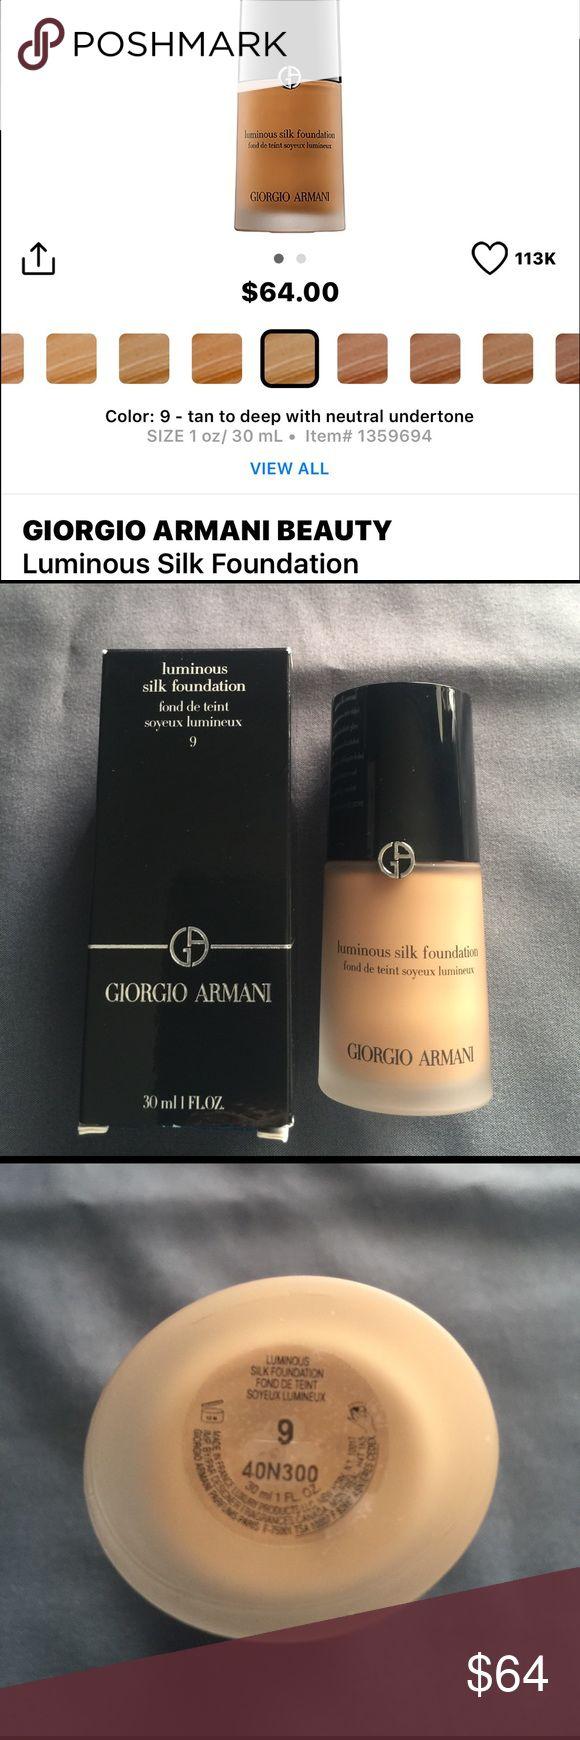 Giorgio Armani Beauty Luminous Silk Foundation New never been open or swatch Giorgio Armani color 9 tan to deep with neutral undertone. Giorgio Armani Makeup Foundation